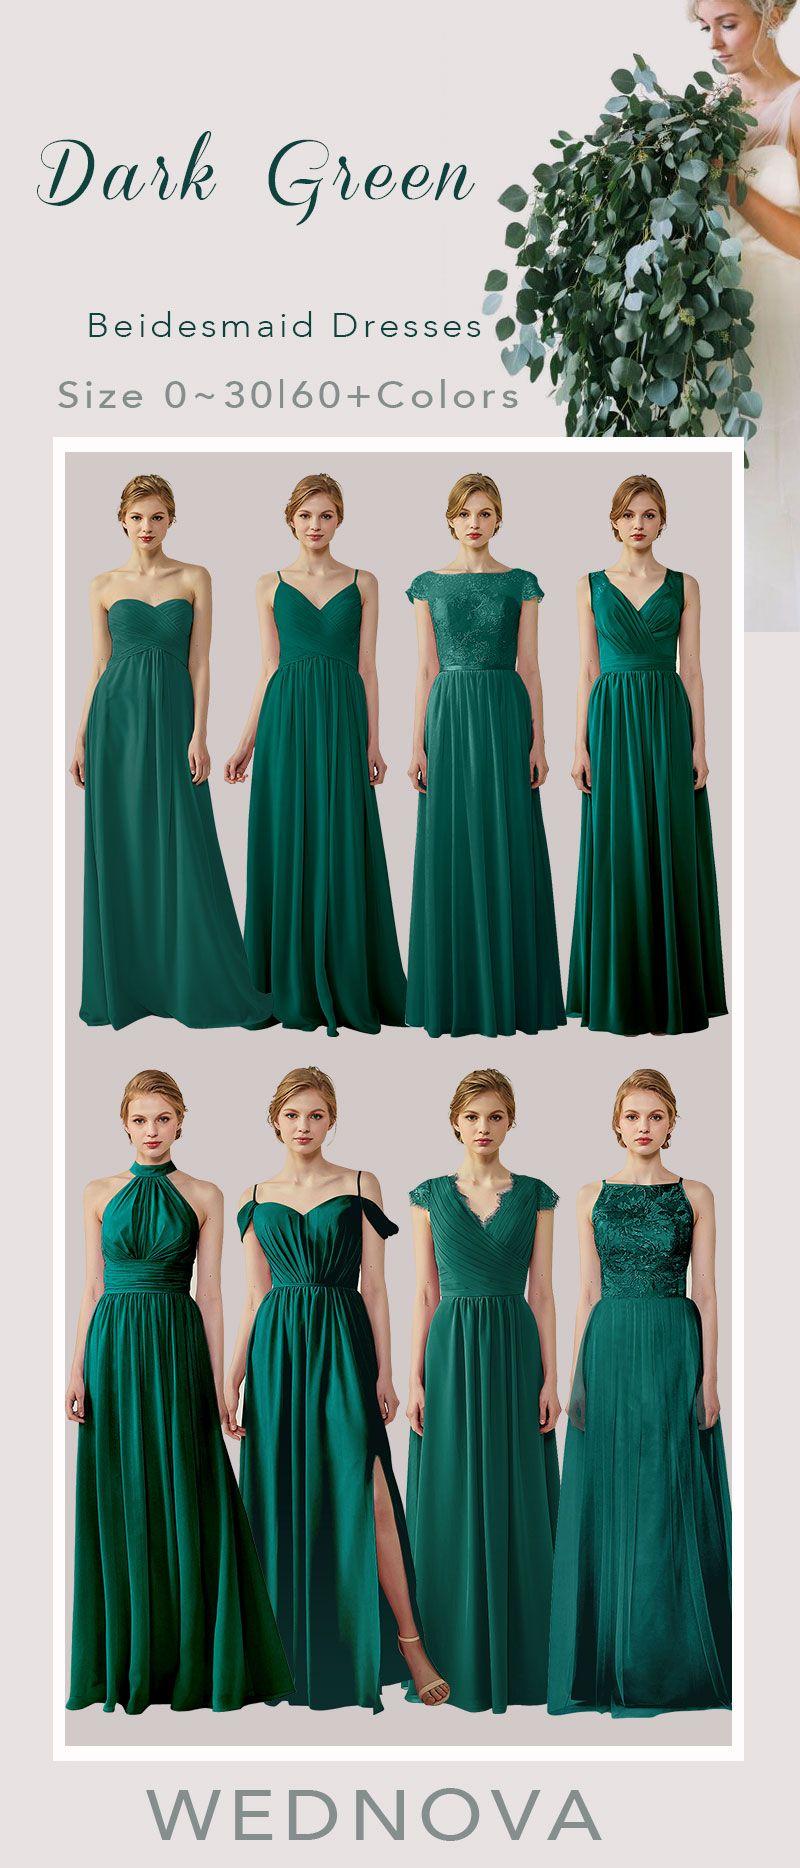 2018 Dark Green Bridesmaid Dresses Chiffon With Lace Beautiful Style Dresses Sweetheart Dress For All Size Weddingdresses Sweetheart Bridesmaid Svadba Dizajn